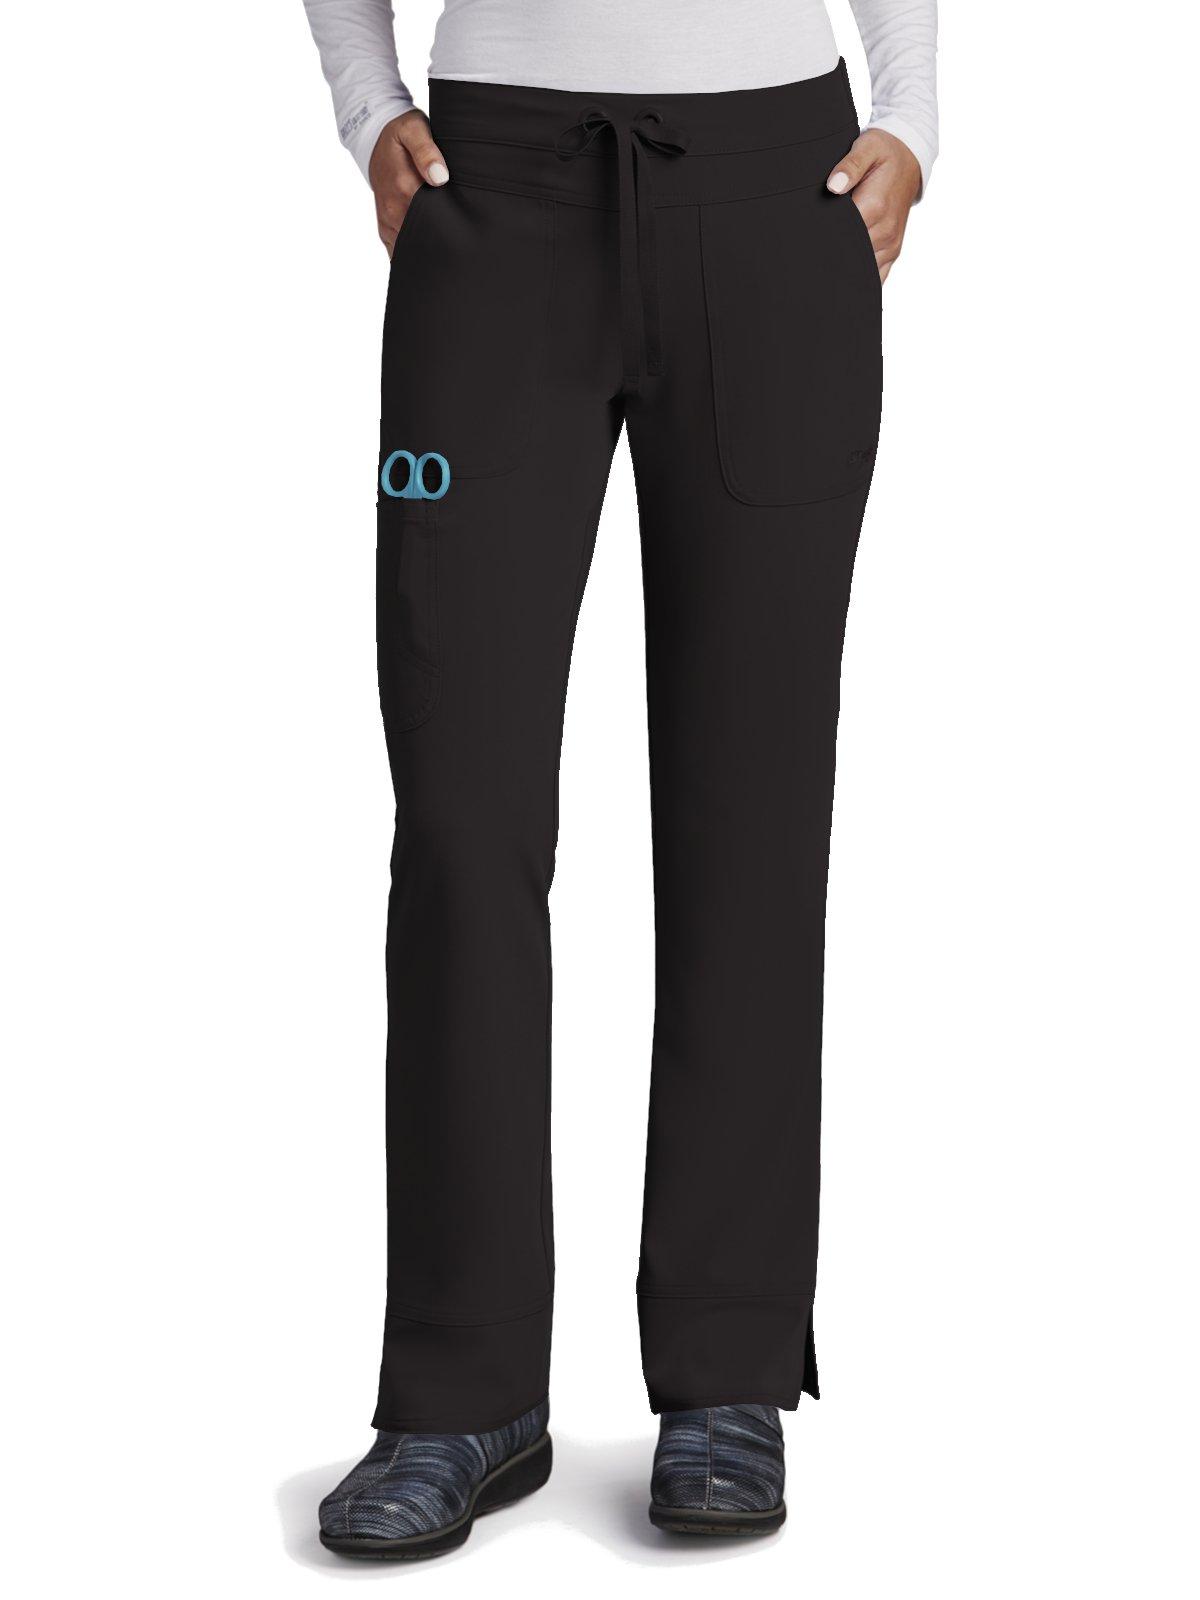 Grey's Anatomy Signature Women's 3 Pocket Low Rise Scrub Pant, Black, Large